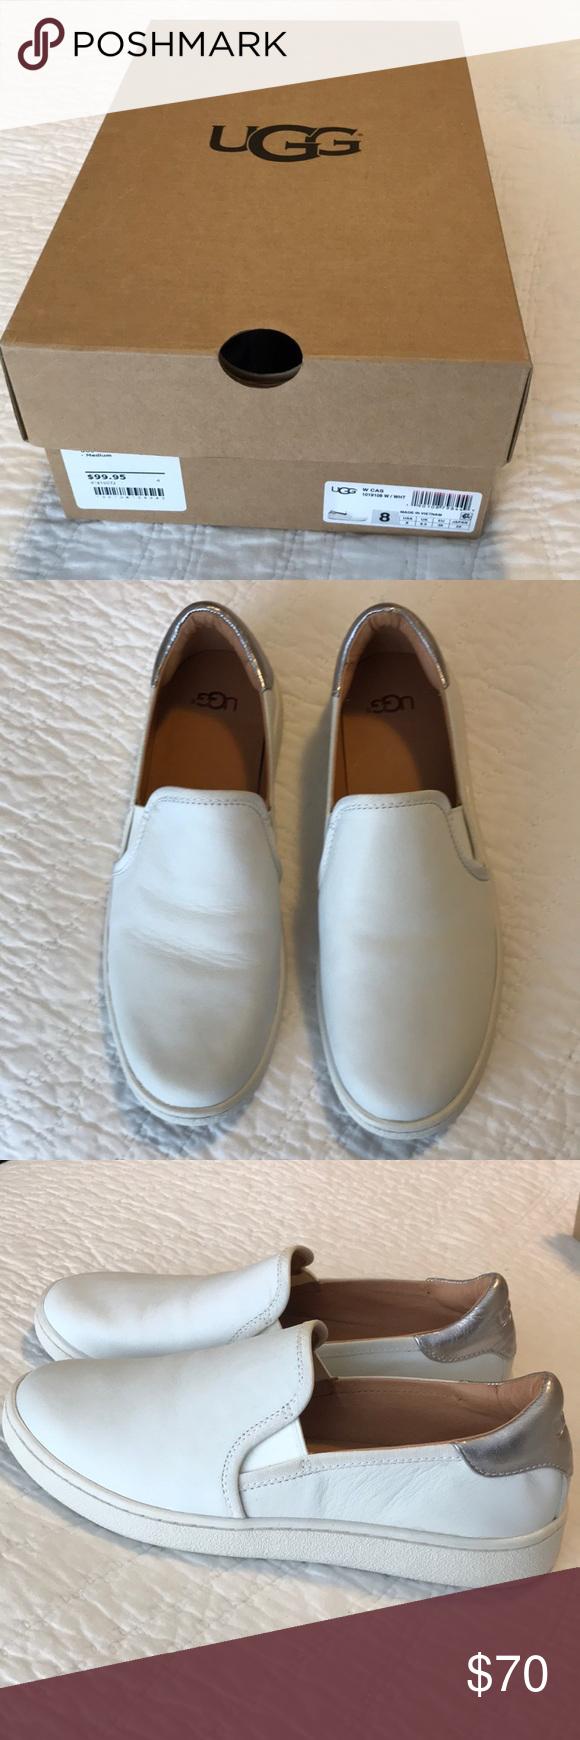 UGG Cas Slip-on white size 8 NWT | Uggs